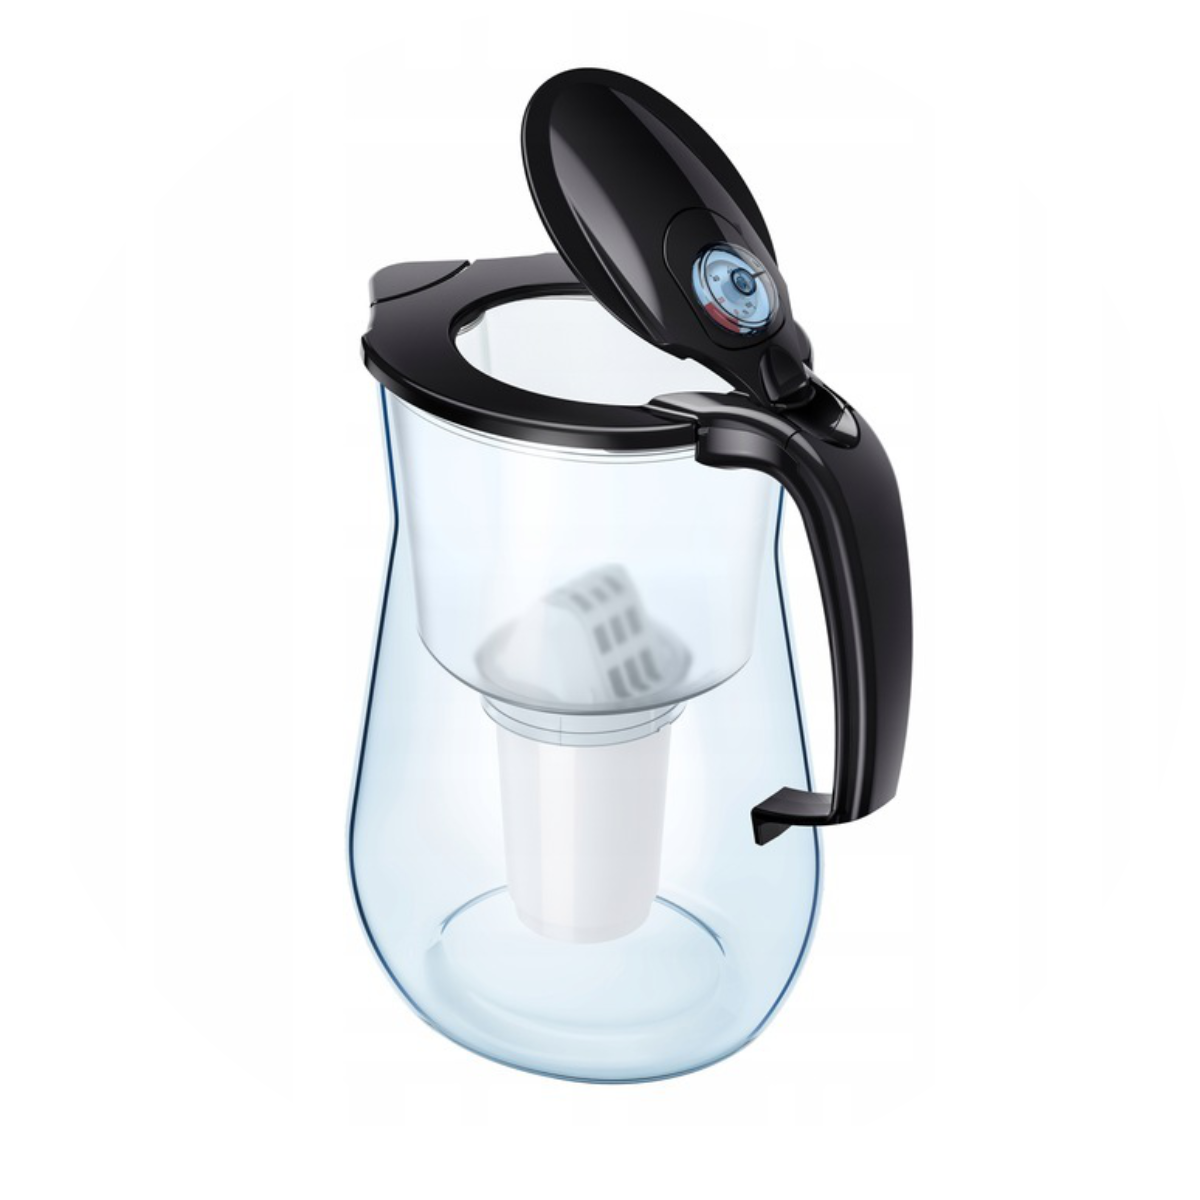 Aquaphor Provence (czarny) dzbanek filtrujący - pokrywka